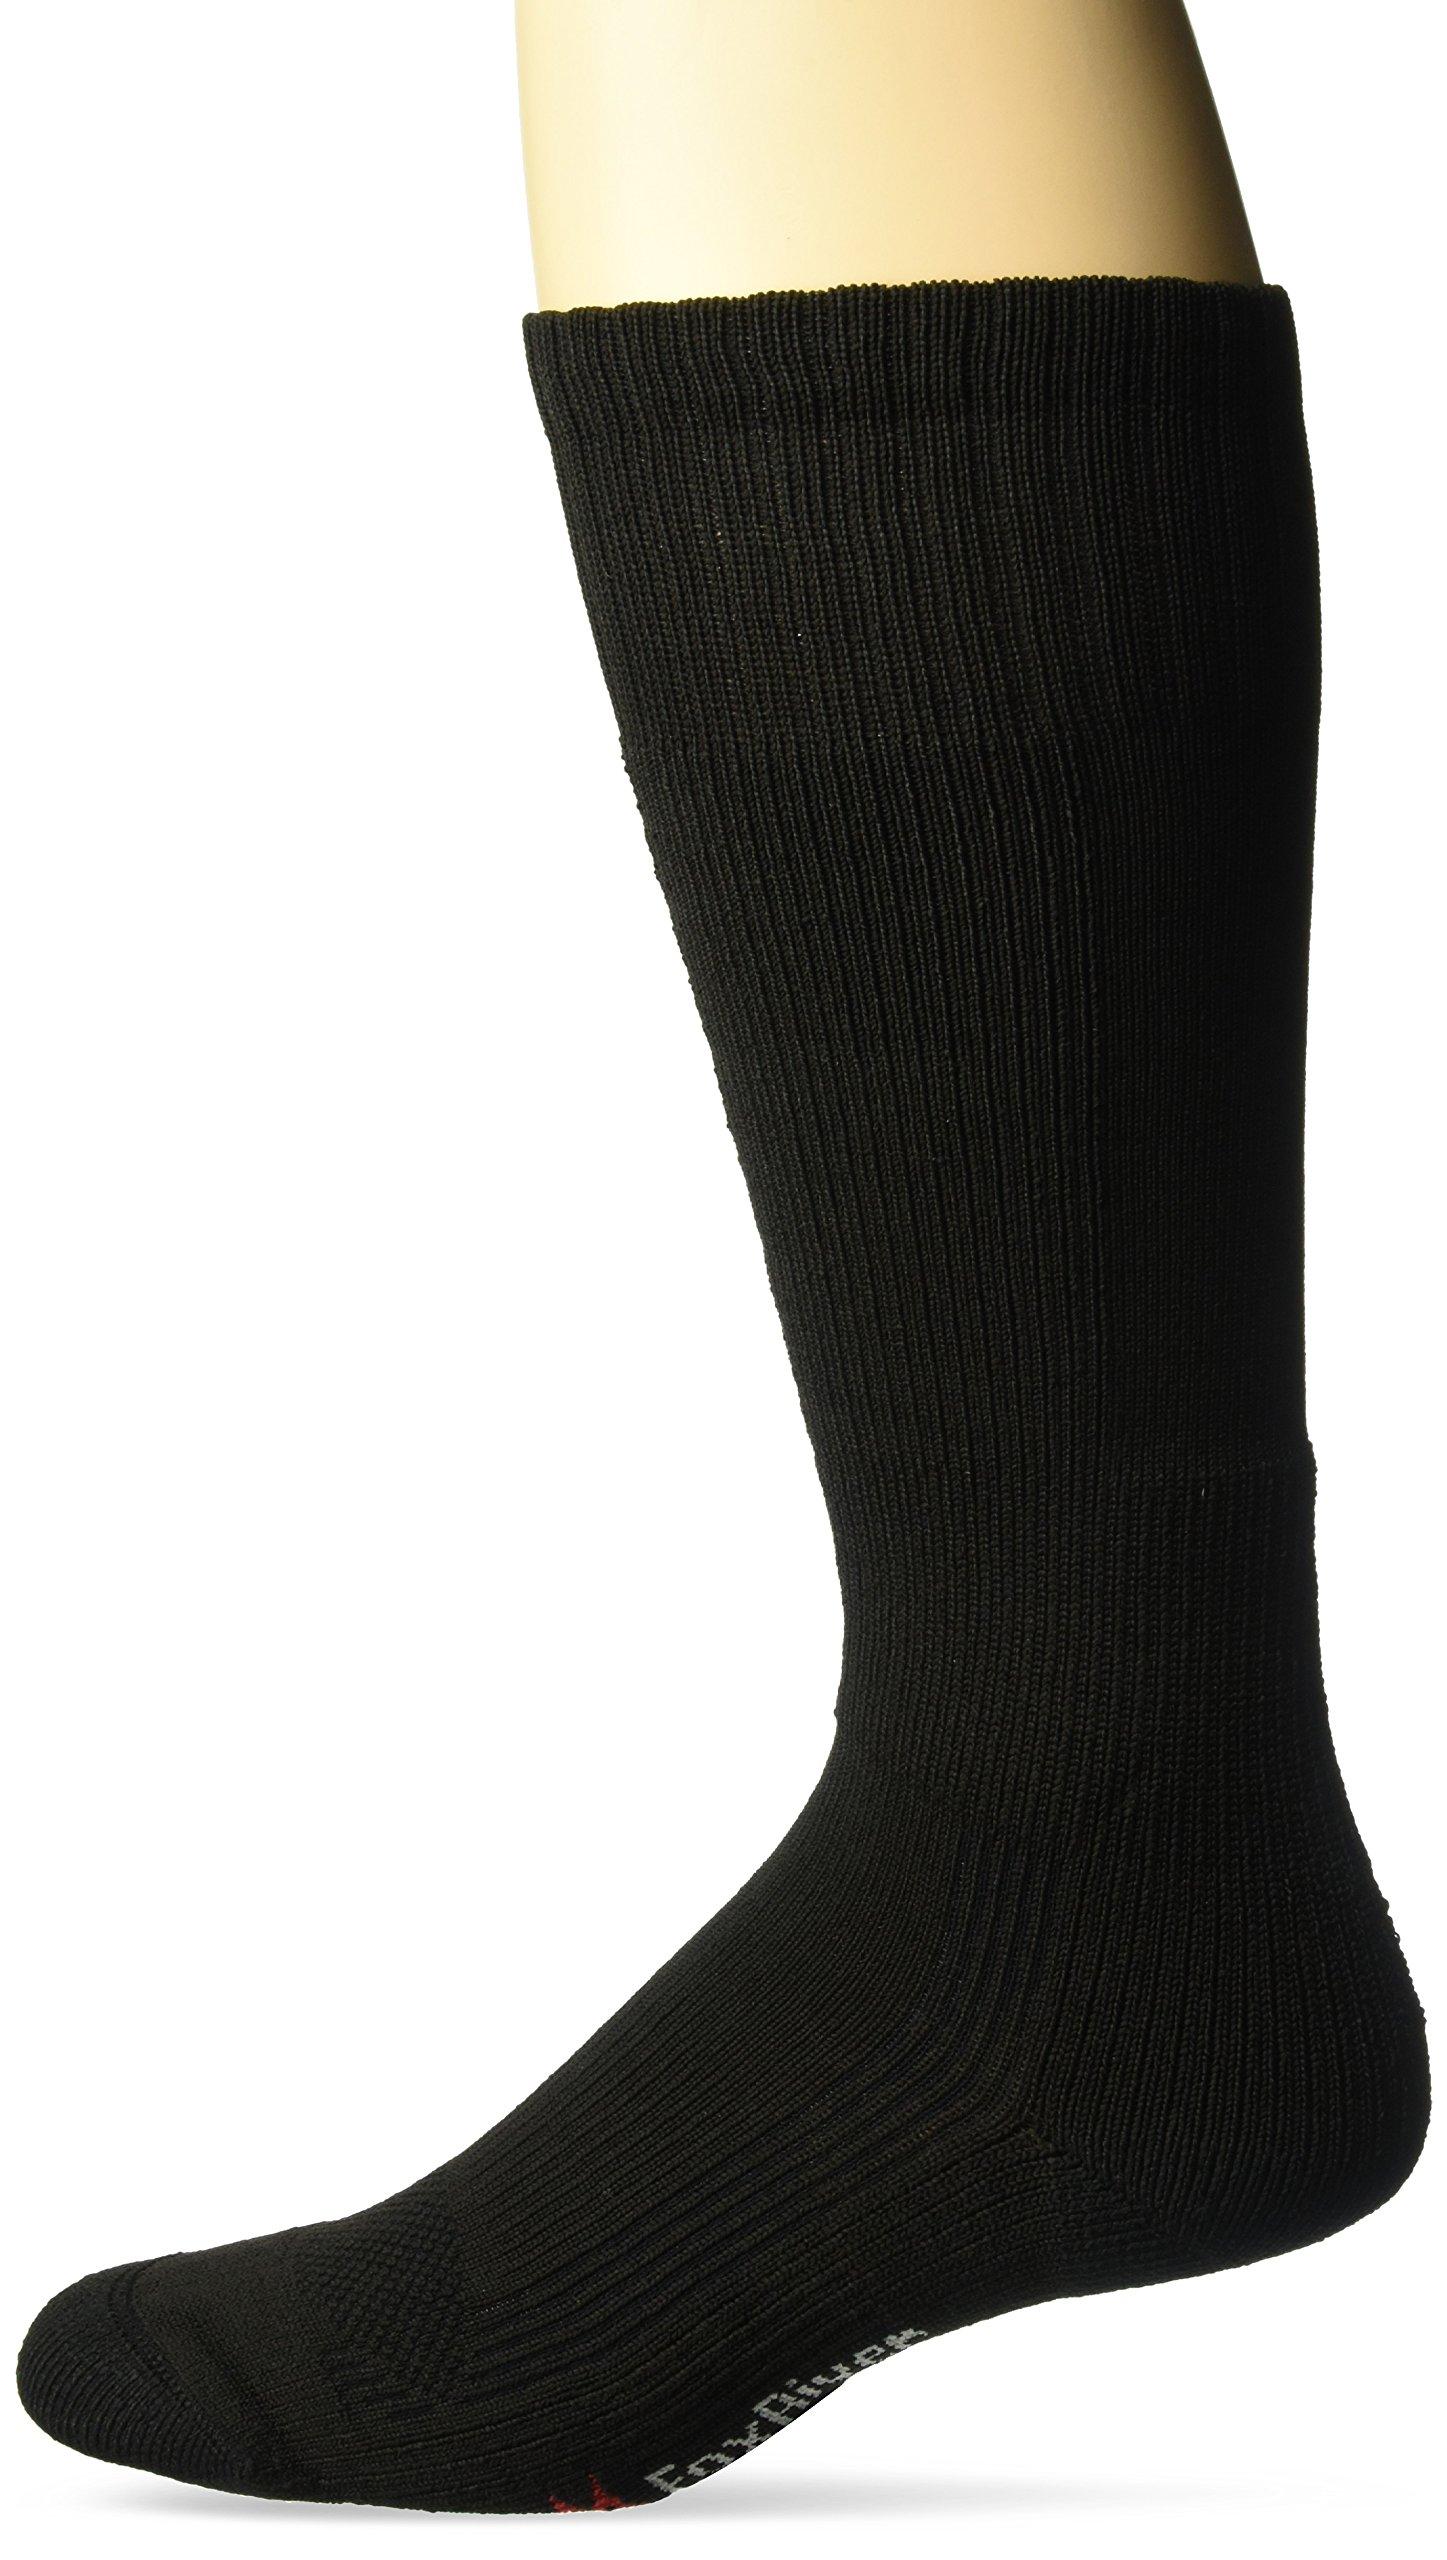 FoxRiver Men's Tactical Bootss Lt Wt Mid-Calf Hiking Socks, Black, Large